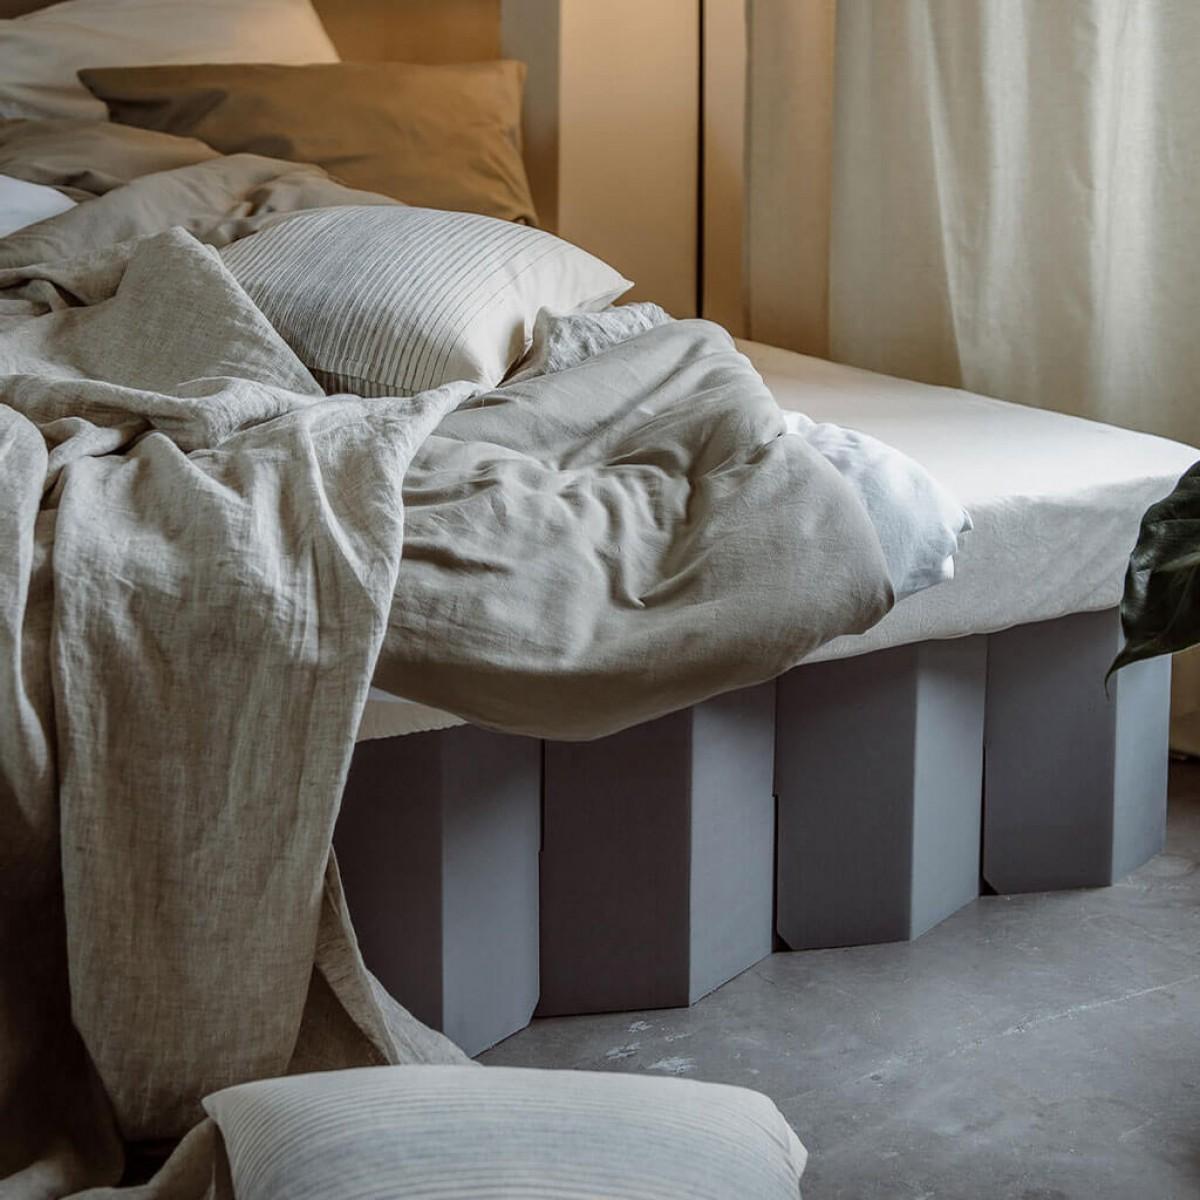 Nachhaltiges Bett 2.0 (kieselgrau) | ROOM IN A BOX